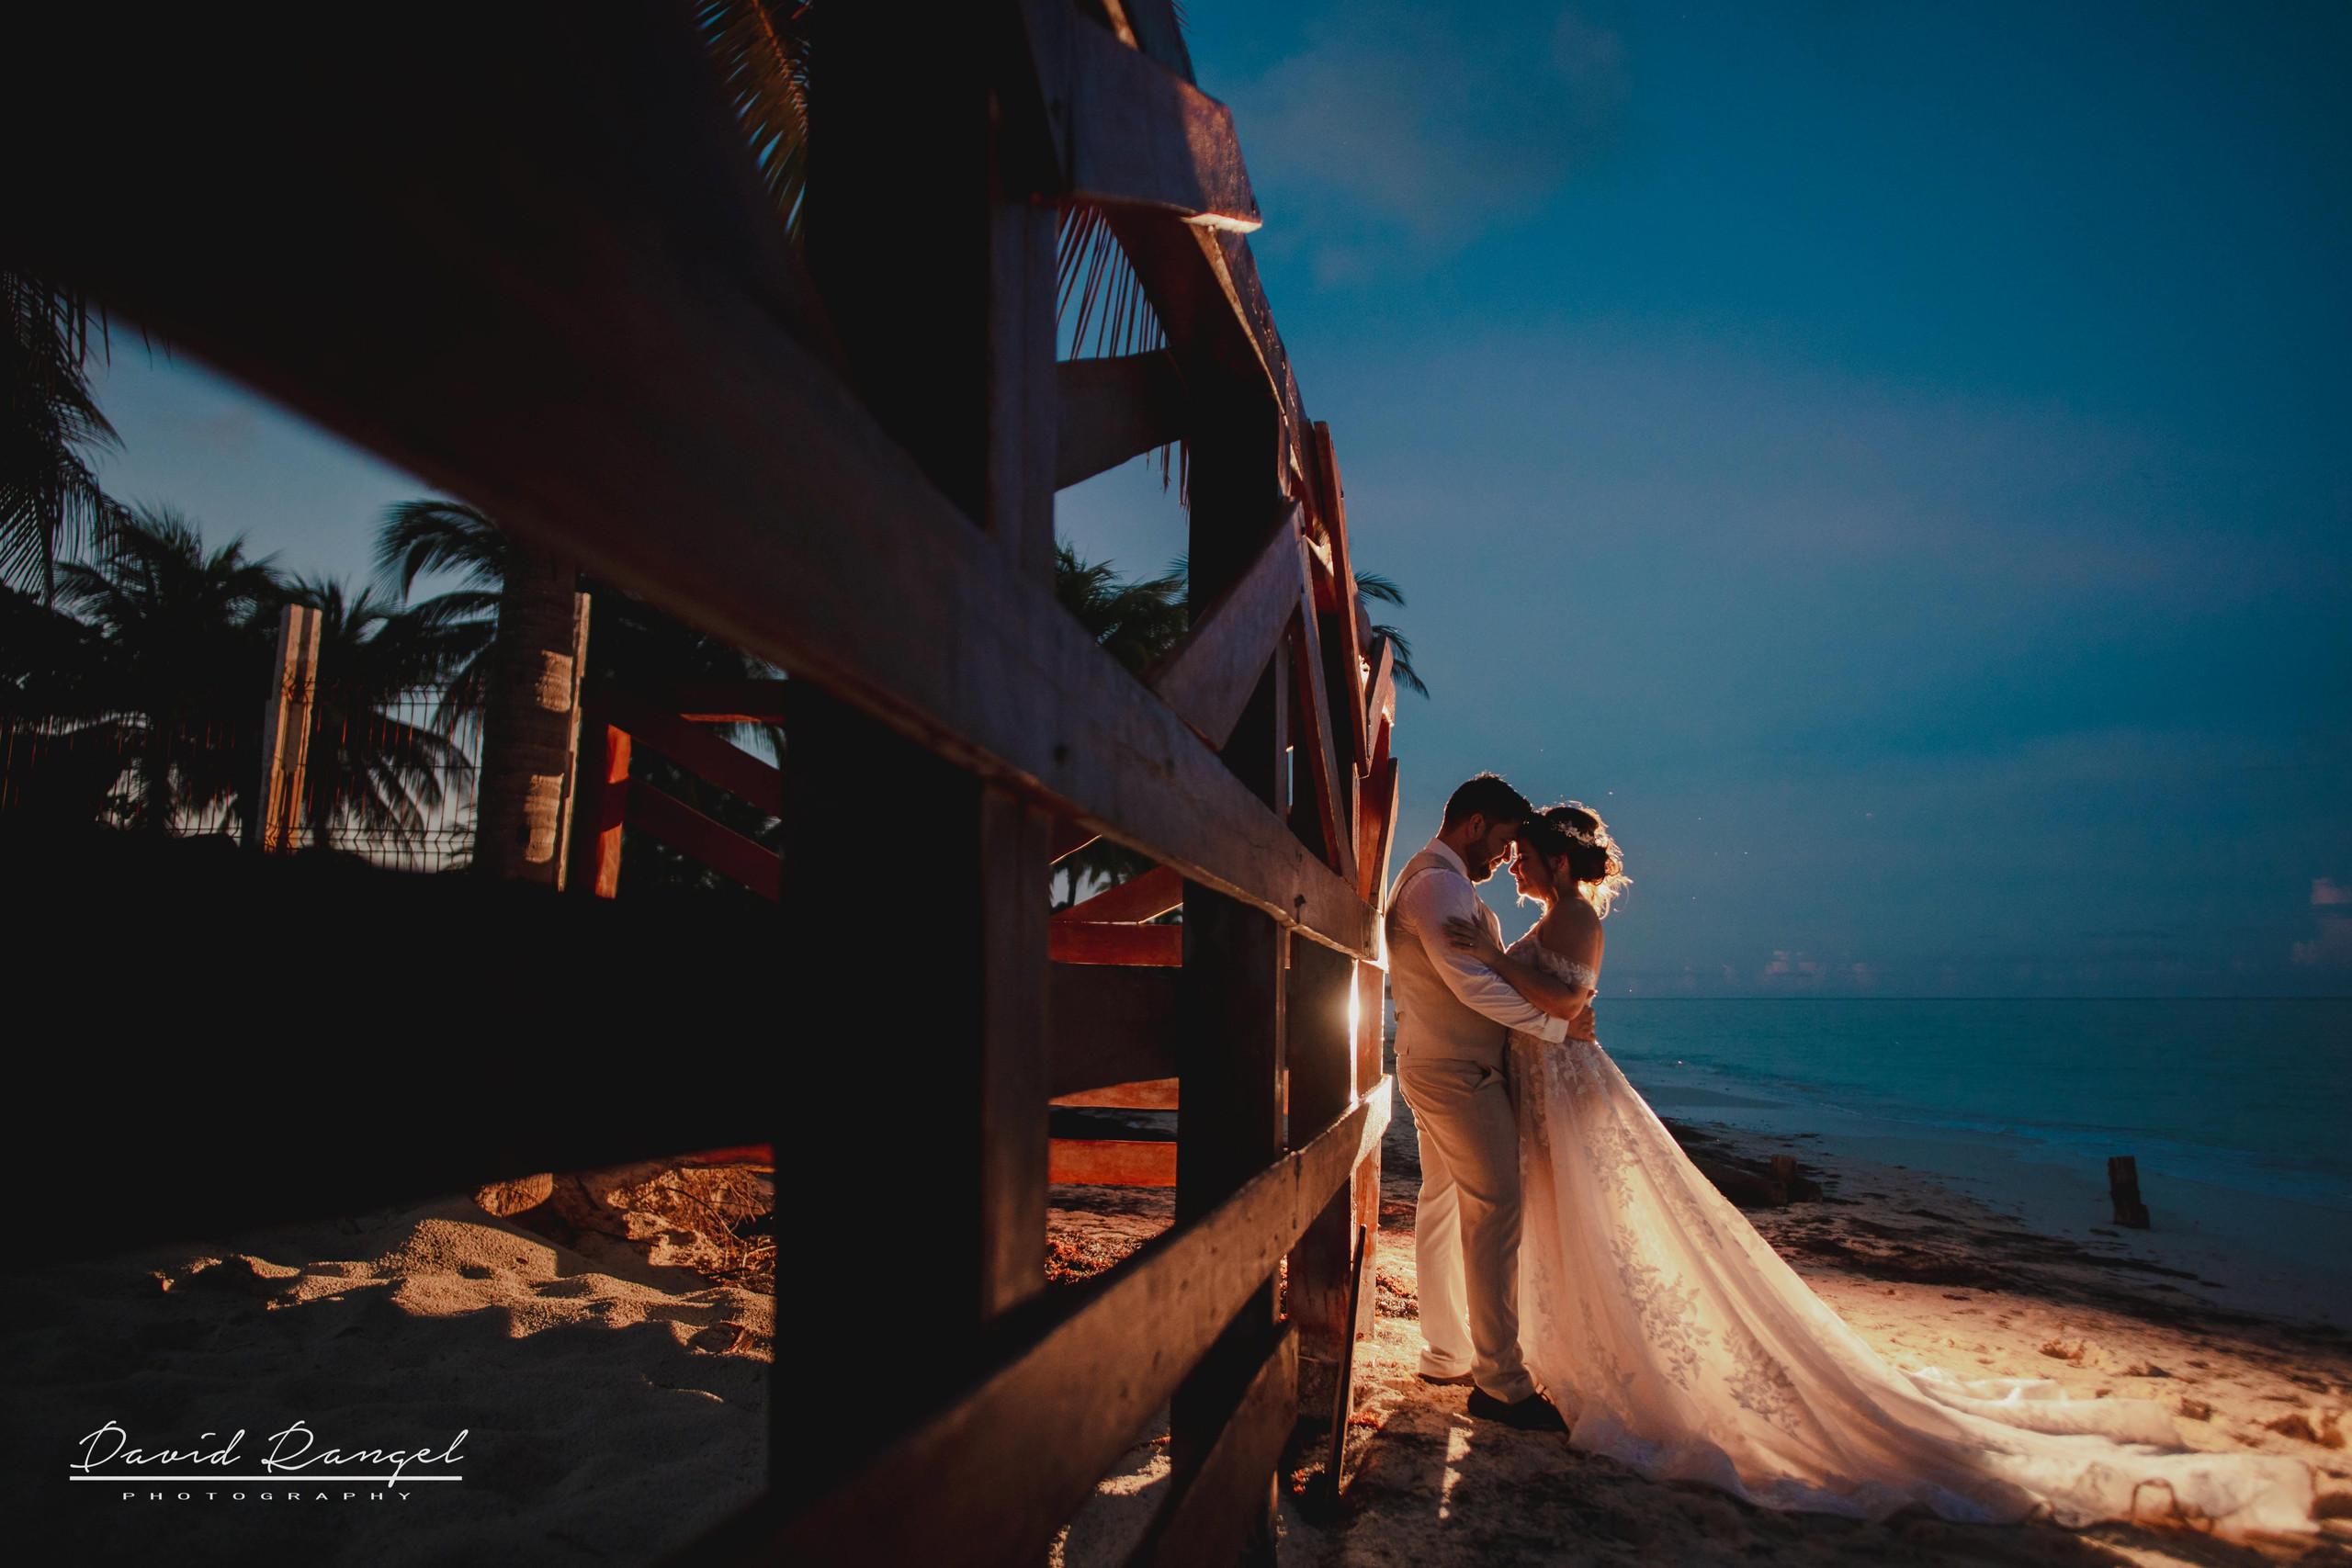 bride+groom+beach+sunset+session+happy+love+couple+celebration+wedding+photo+beach+caribean+sea+photographer+david+rangel+dress+suit+villa+chenera+back+light